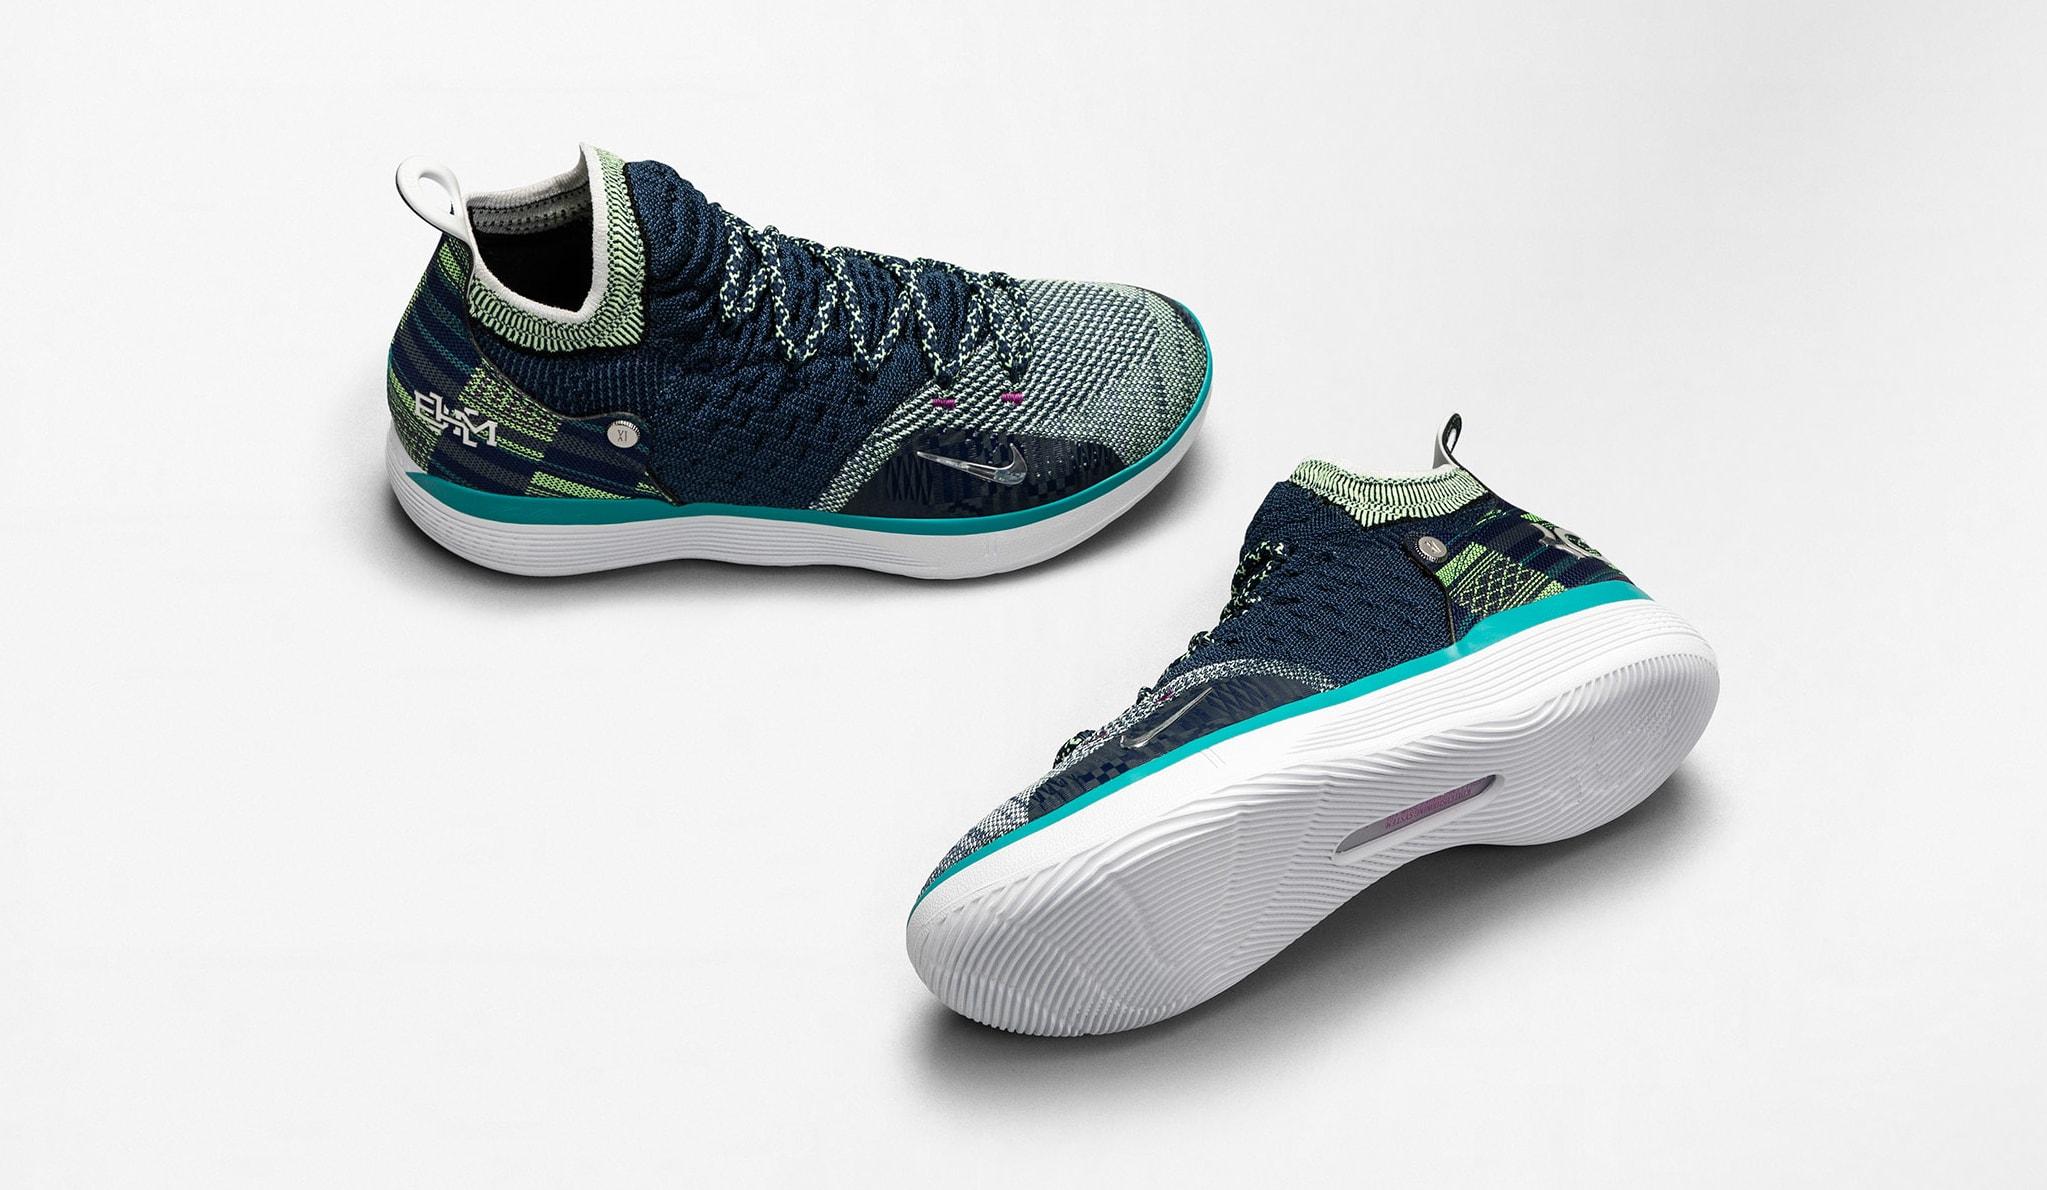 Nike BHM 2019 KD 11